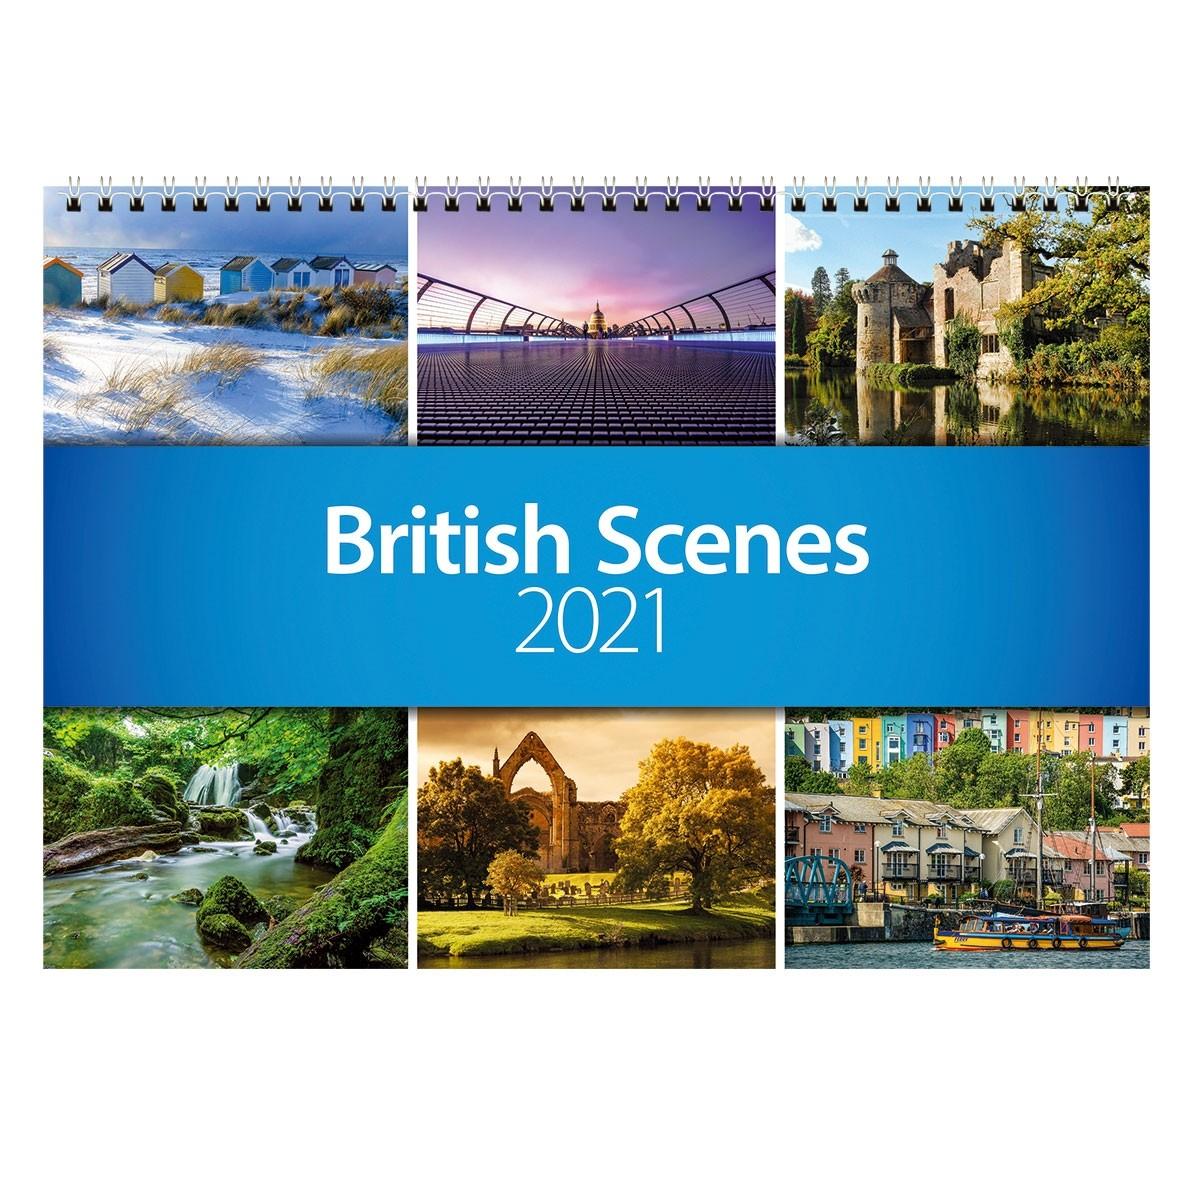 2021 British Scenes Wall Calendar